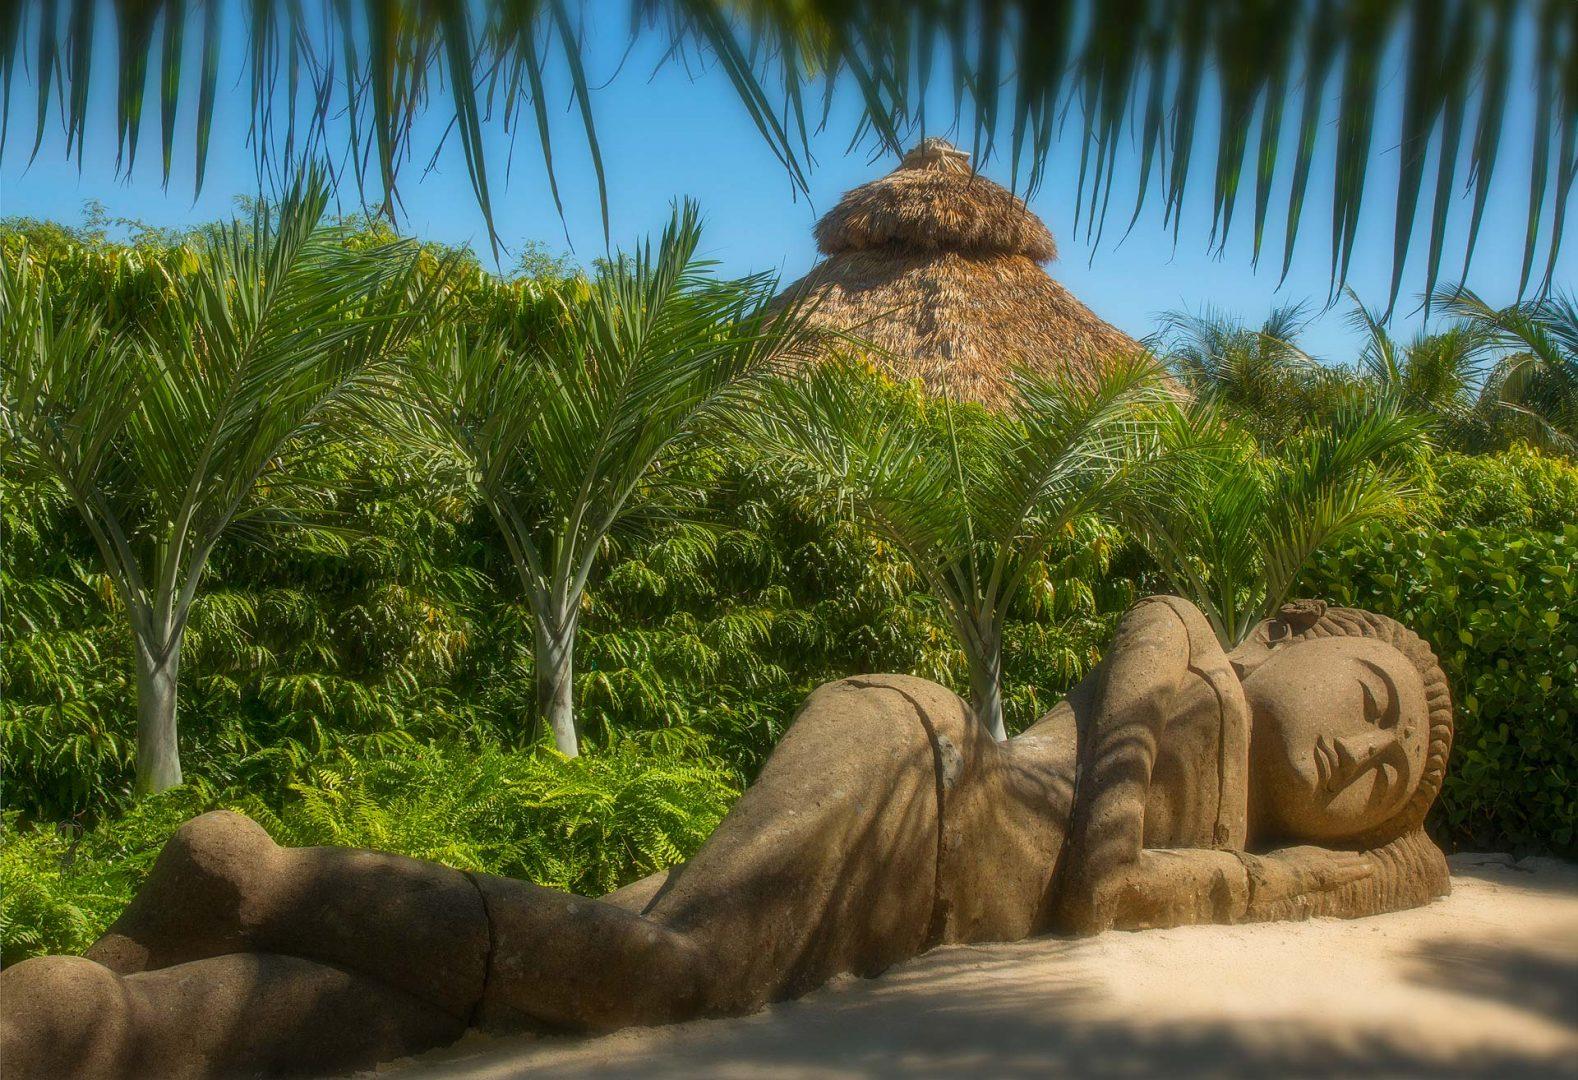 large sleeping statue on a sandy beach